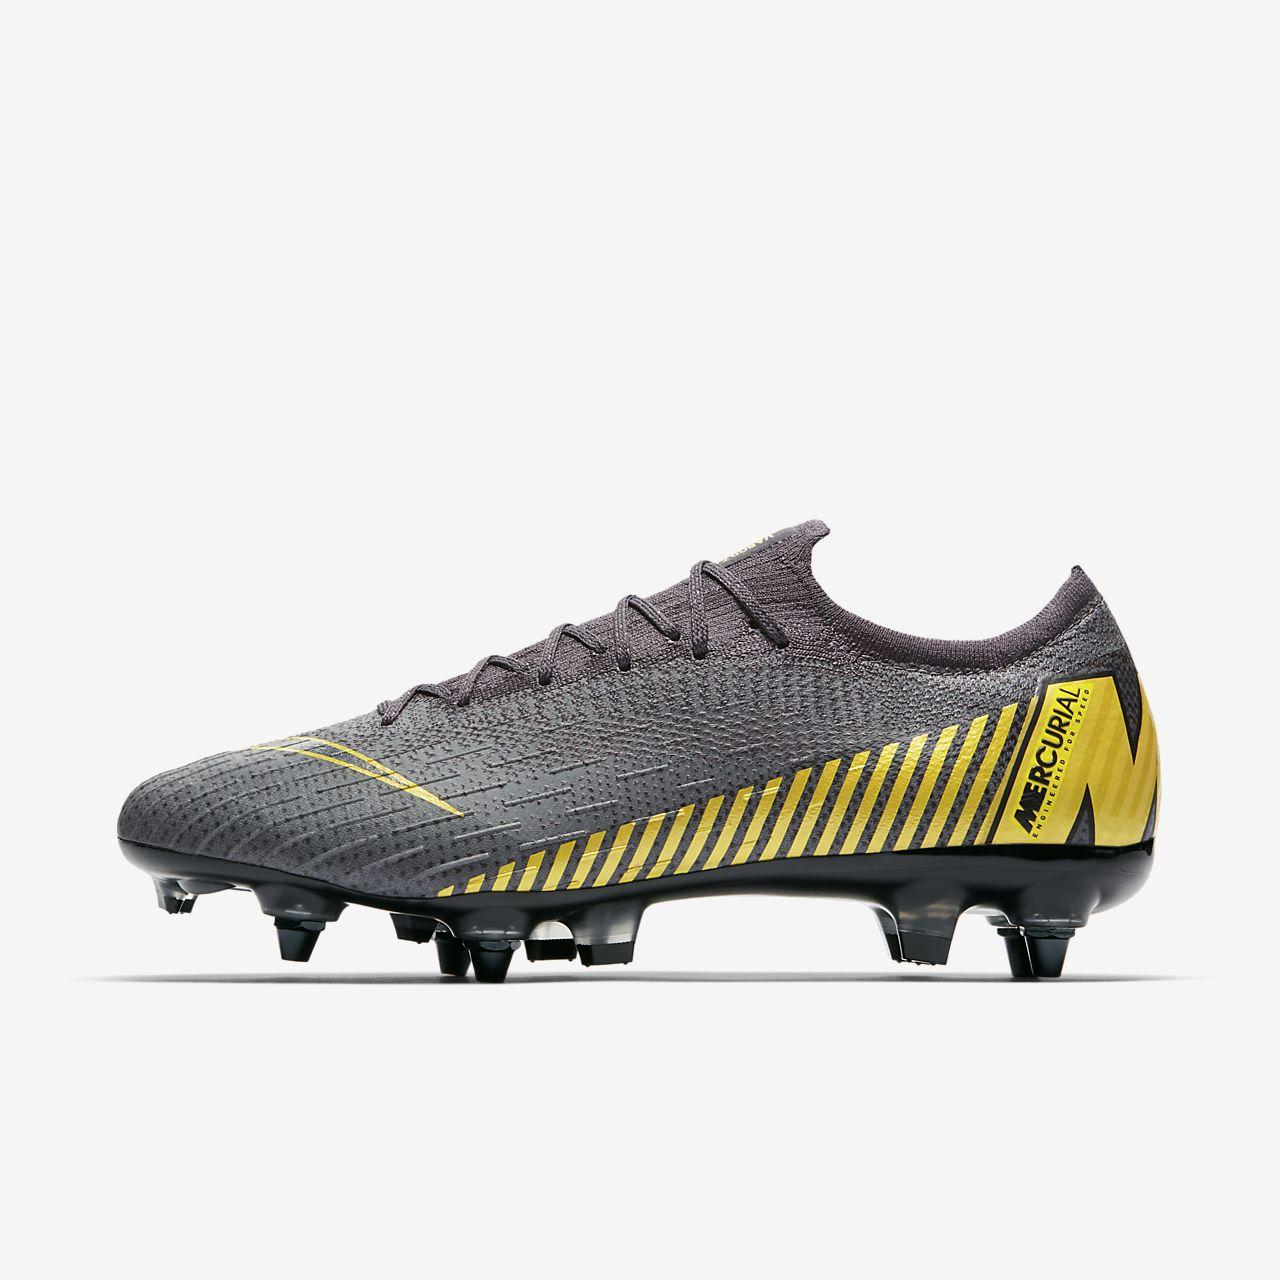 big sale a7274 9c256 ... Fotbollssko för mjukt underlag Nike Mercurial Vapor 360 Elite SG-PRO  Anti-Clog